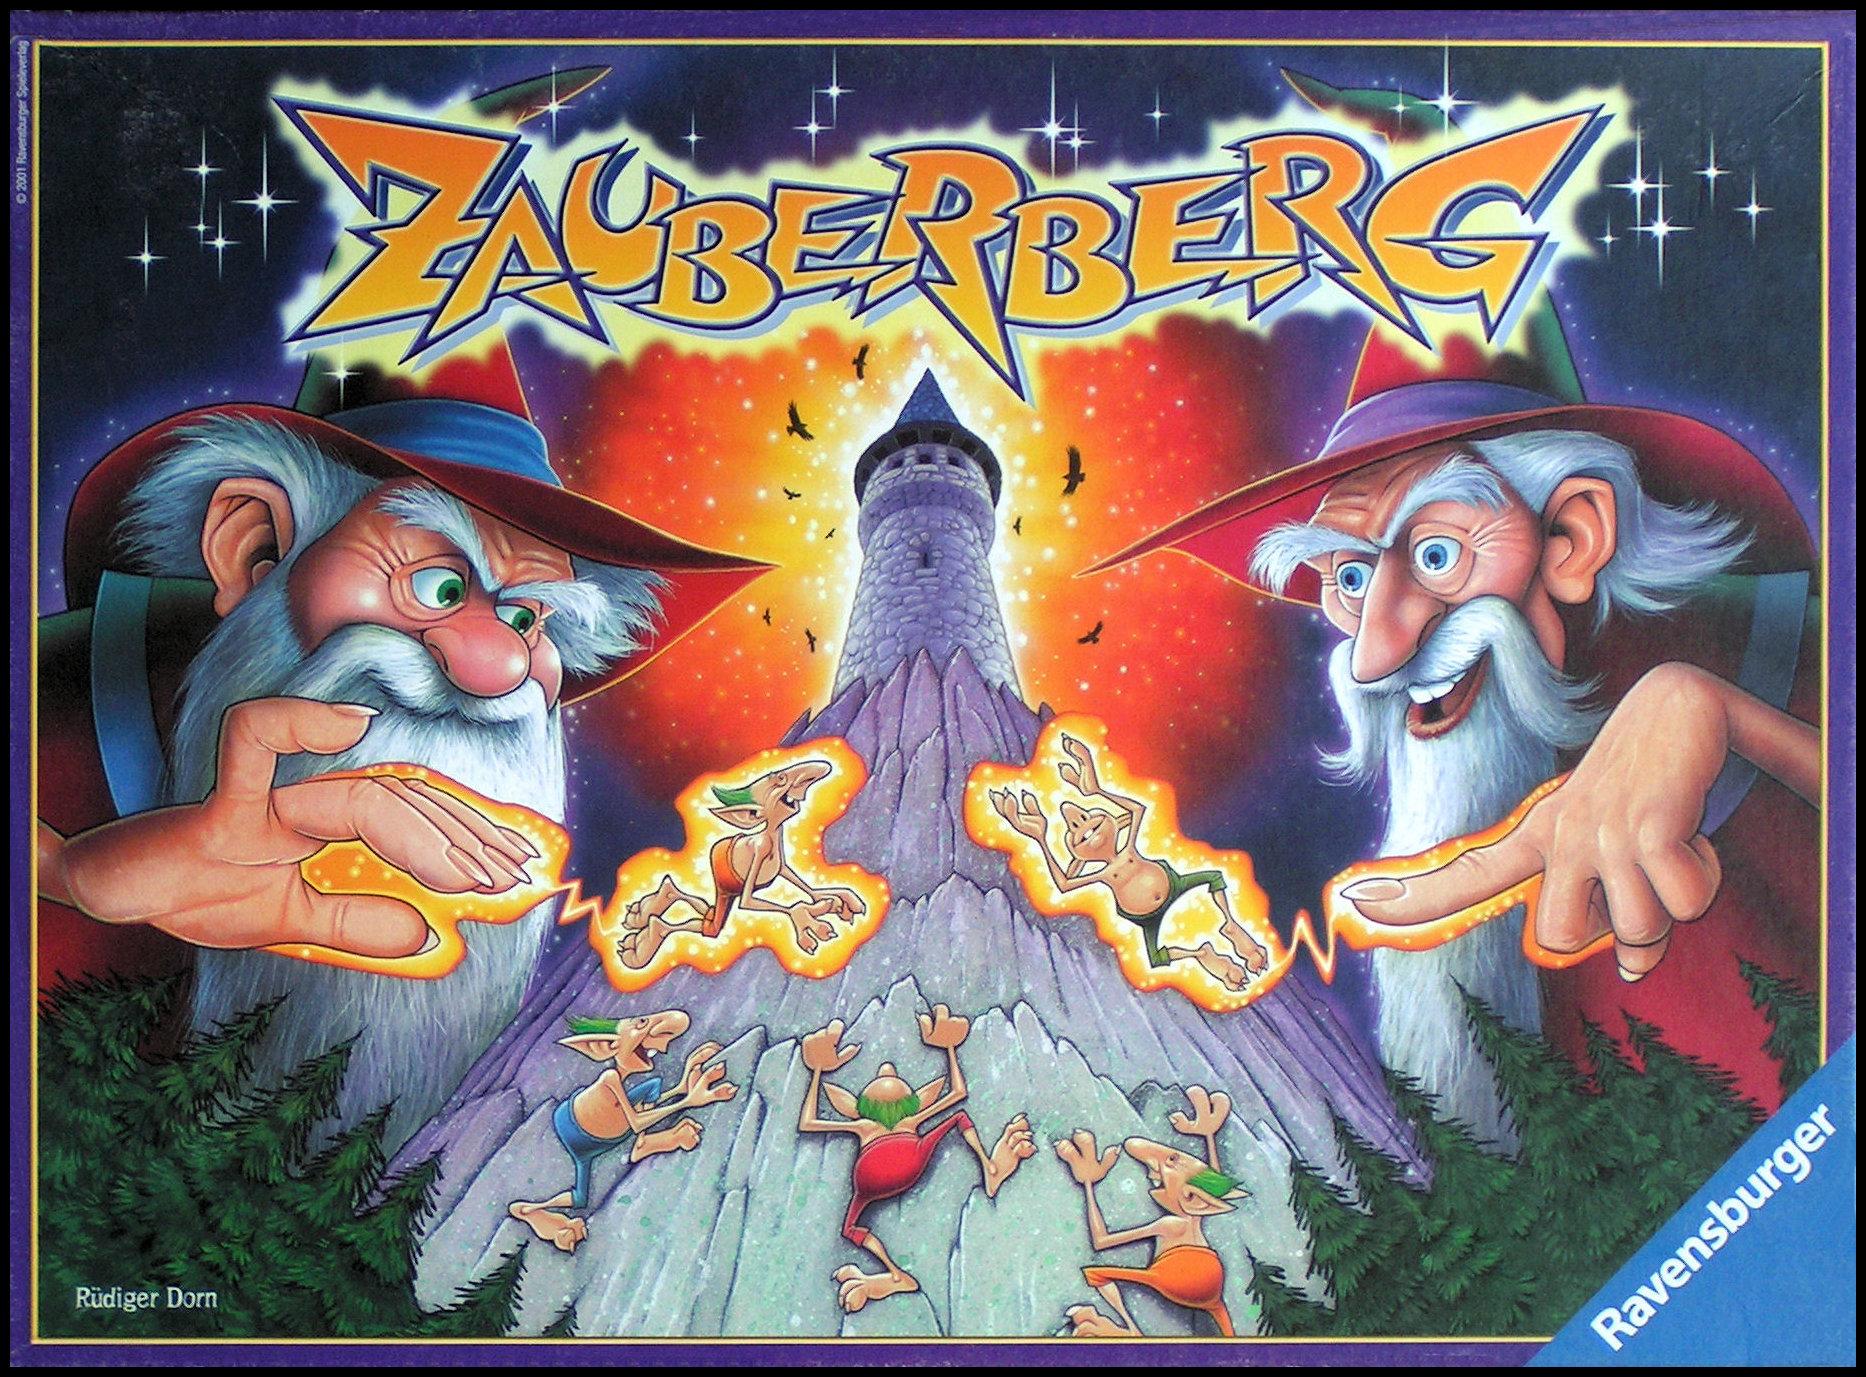 Zauberberg - The Box Front